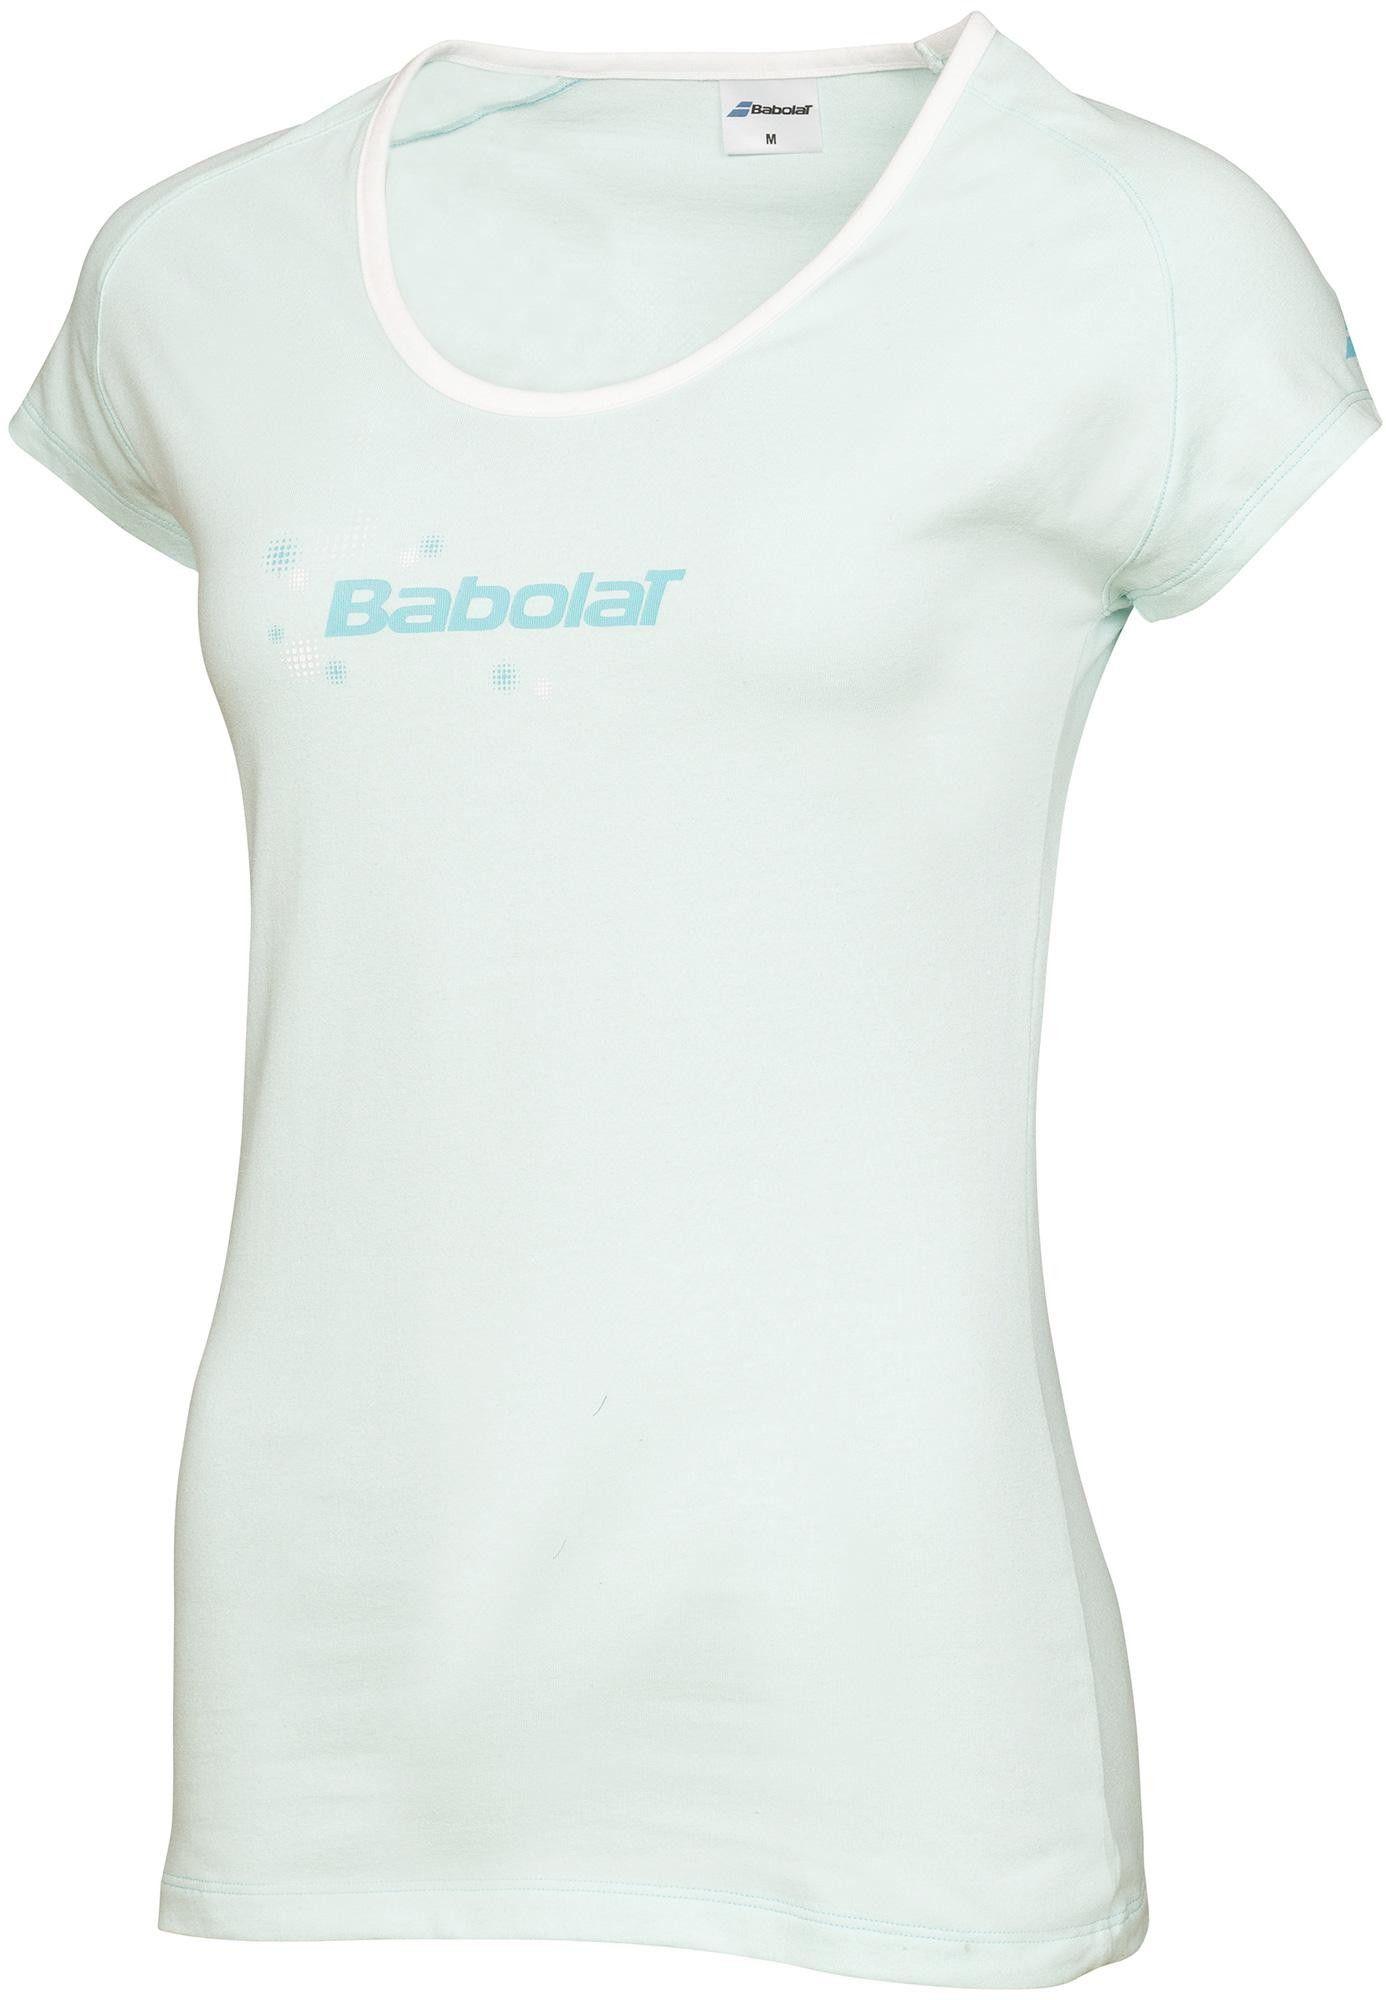 Babolat Core Girl T-Shirt - hawai